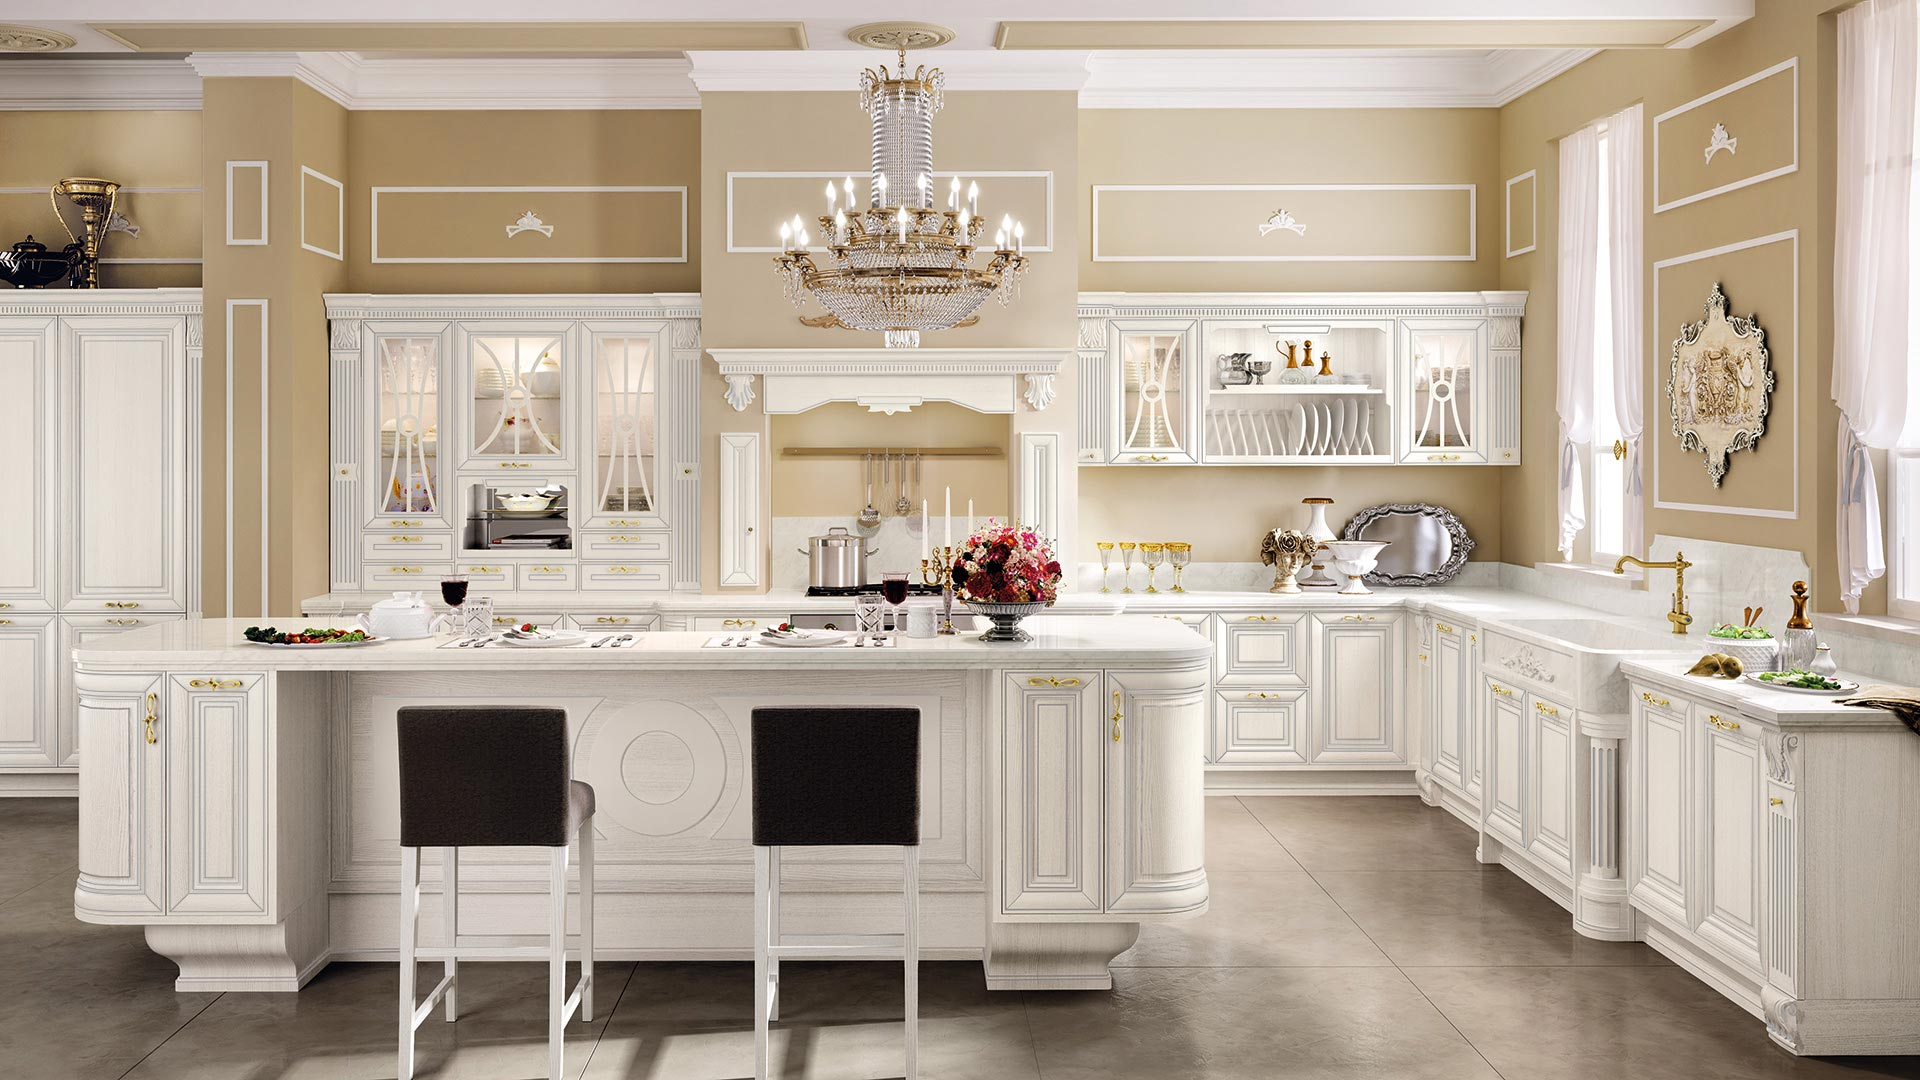 Pantheon - Cucine Classiche - Cucine LUBE